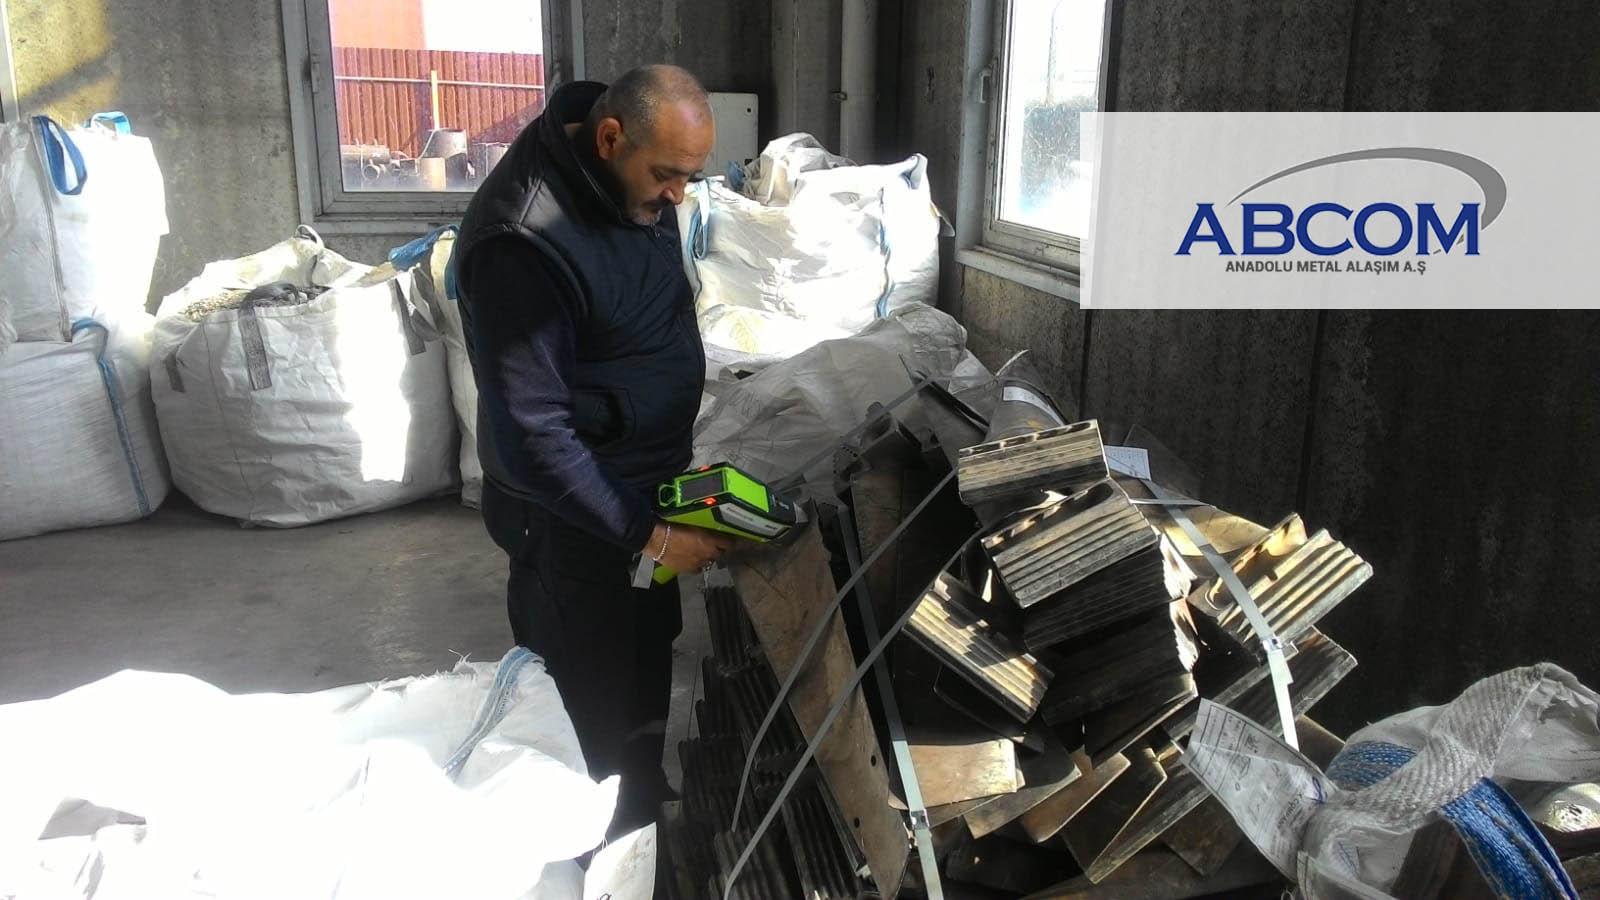 Abcom Anadolu Metal Alaşım, Metal Analizleri İçin Taşınabilir XRF Analiz Cihazları Devi Thermo Scientific'in Niton XL2 Plus Modelini Tercih Etti!